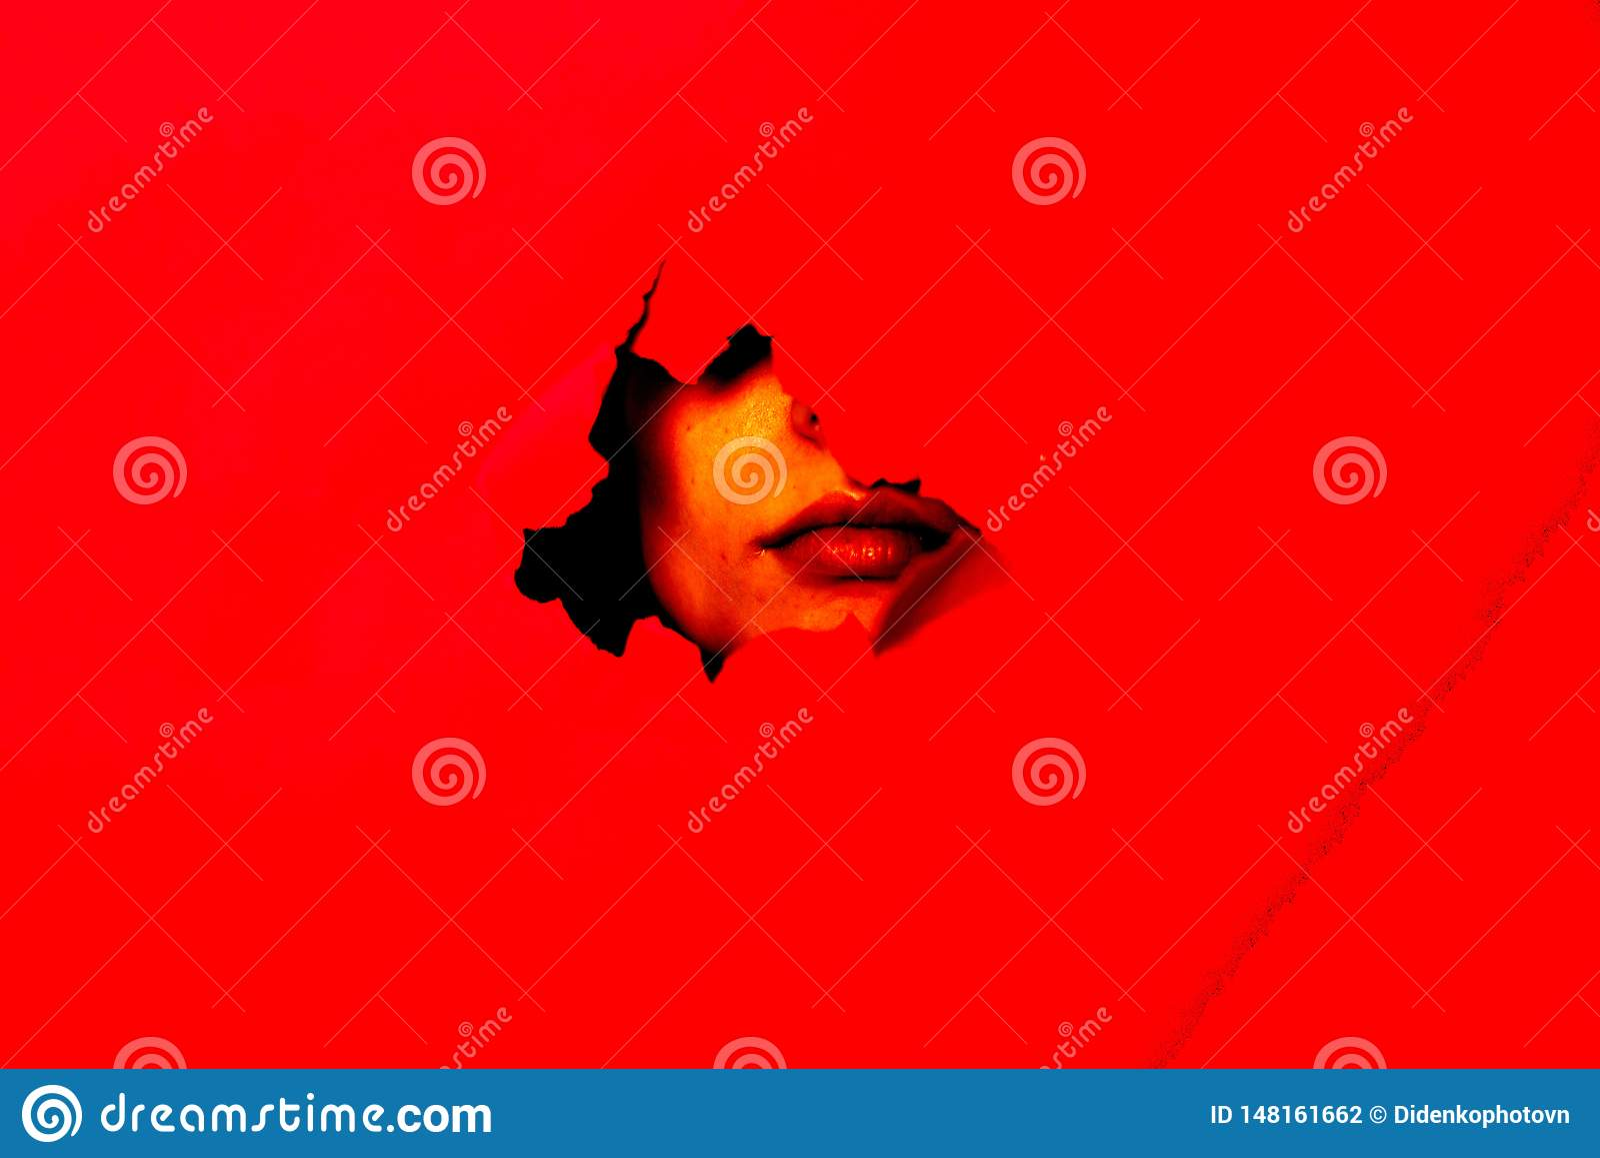 På den röda bakgrunden kan framsidan ses i hålet